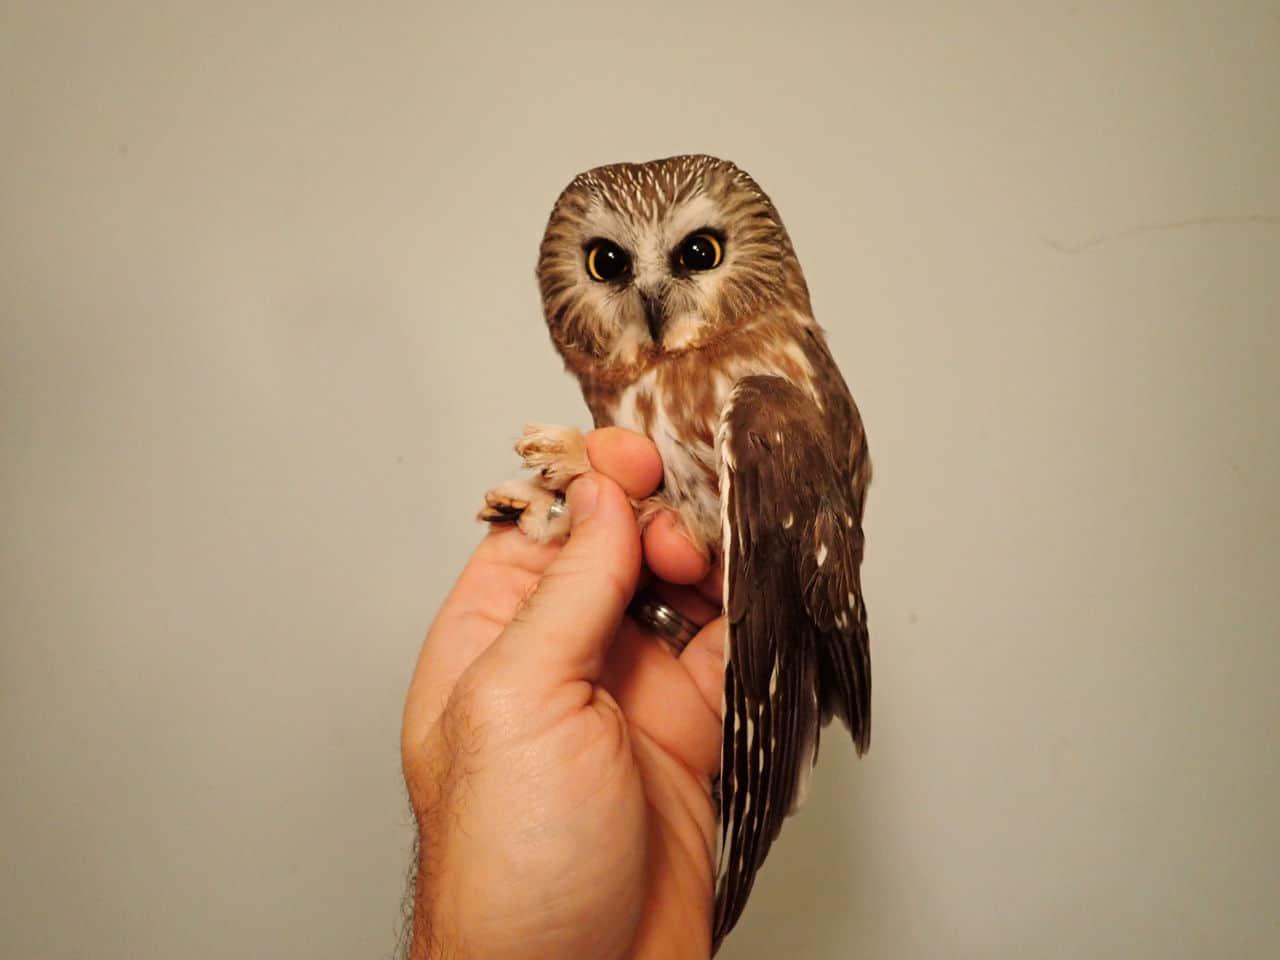 06 Nov 2020 - Northern Saw-whet Owl